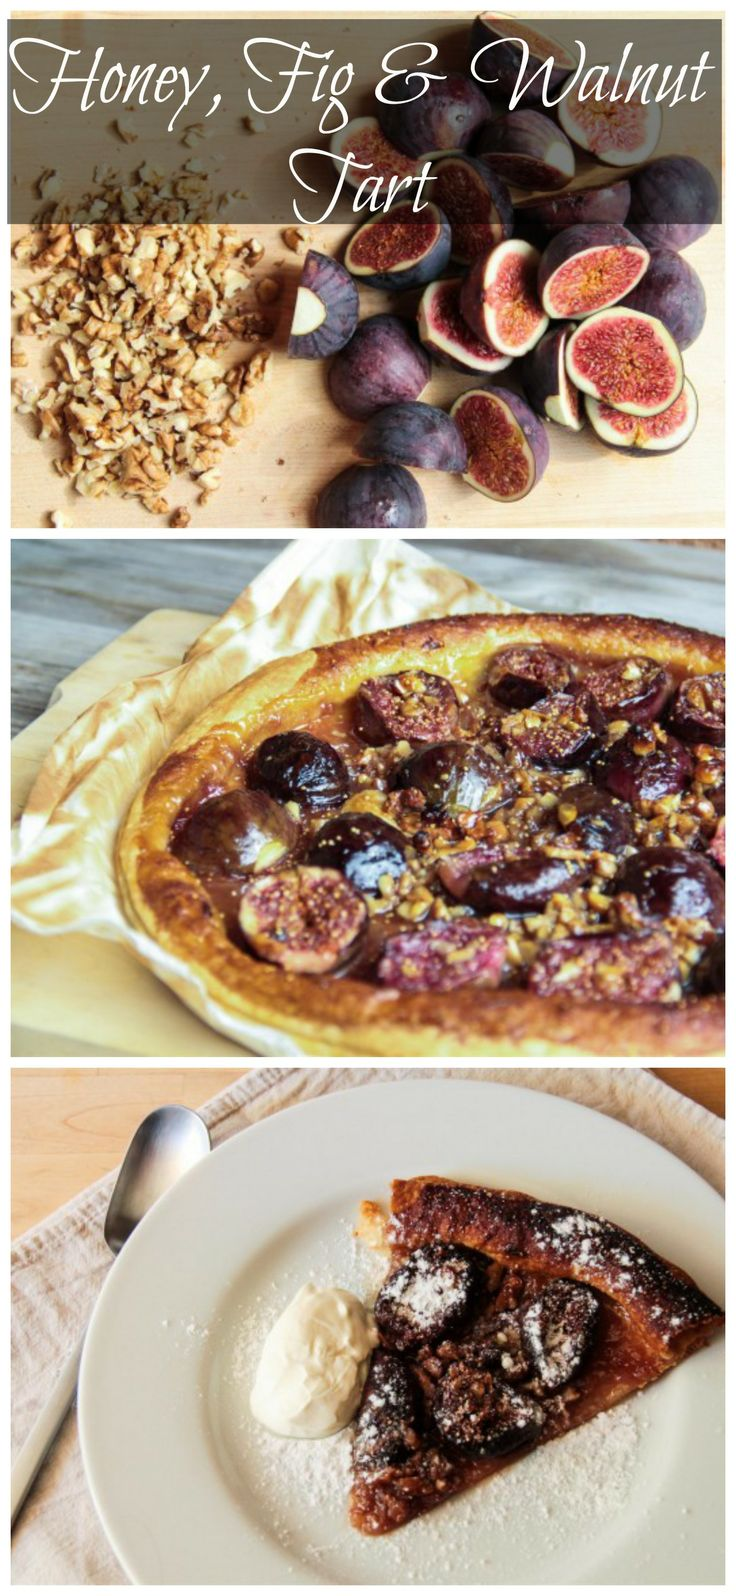 Honey, FIg & Walnut Tart | Food - Pies & Tarts | Pinterest